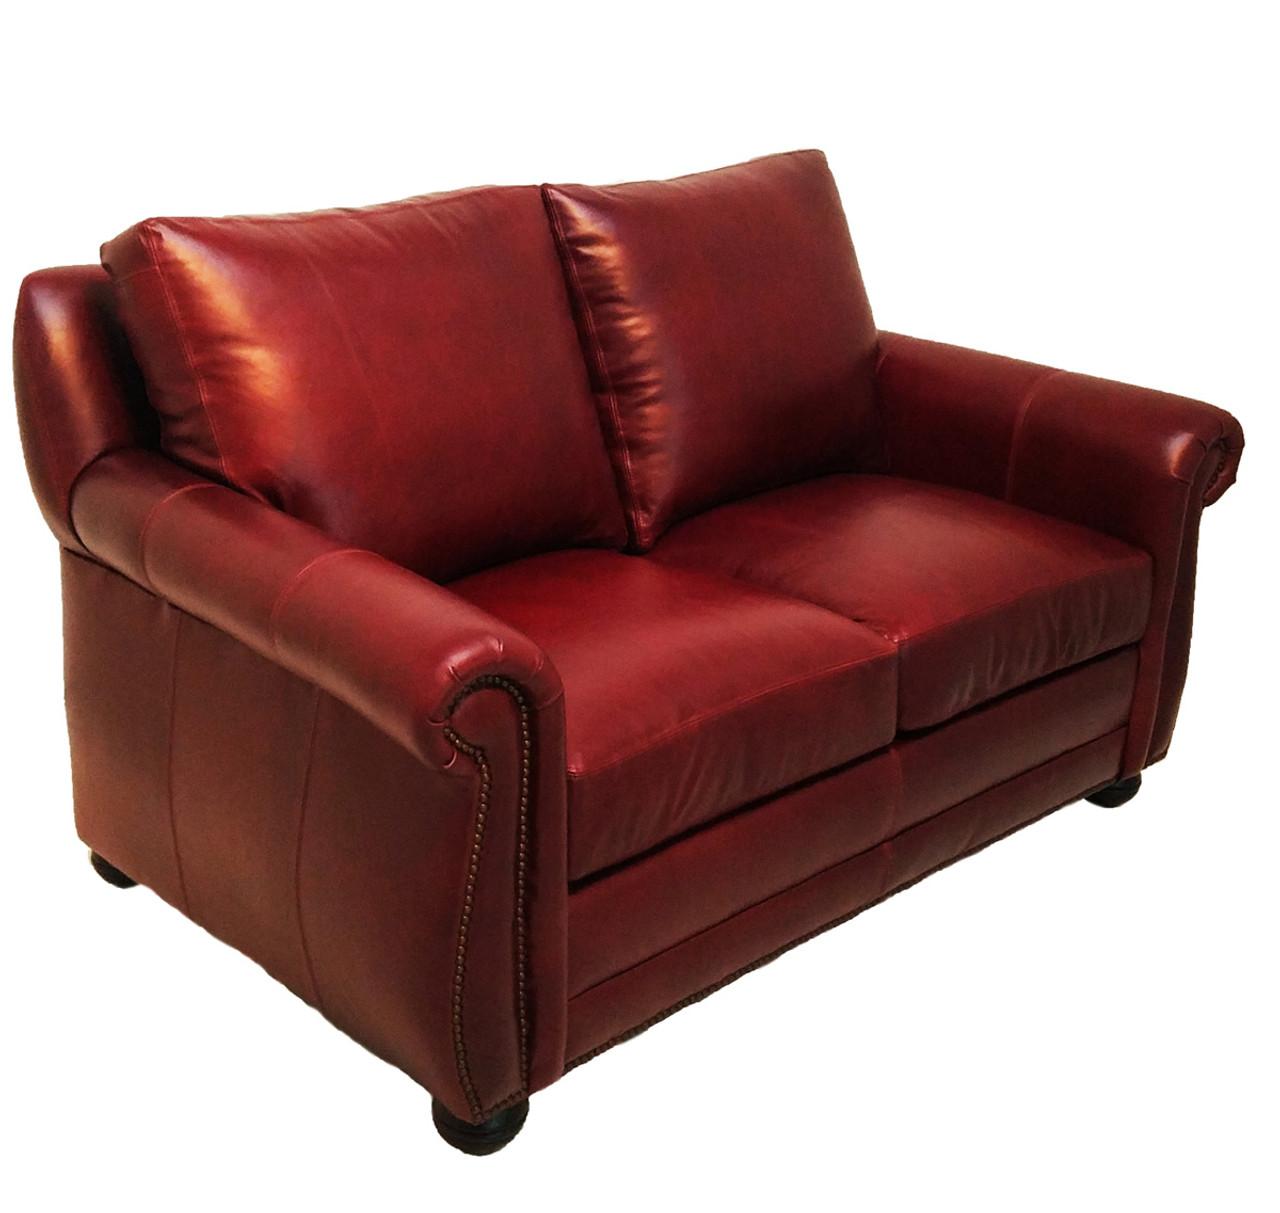 Miraculous American Heritage Palmer Sofa 20 Off Ibusinesslaw Wood Chair Design Ideas Ibusinesslaworg